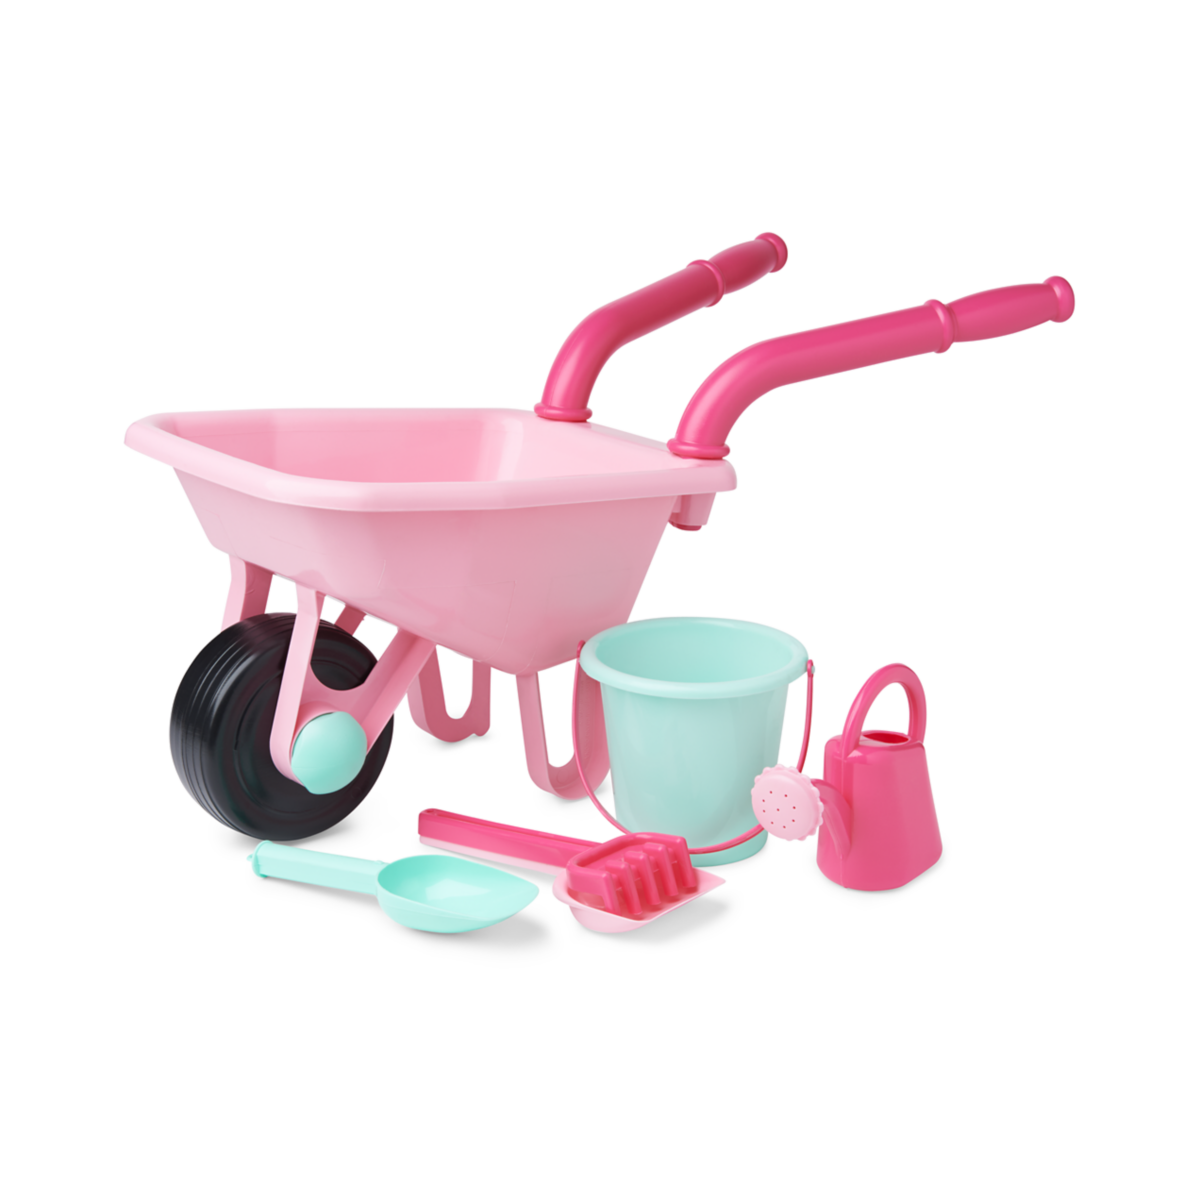 Early Learning Centre Wheelbarrow Set - Pink